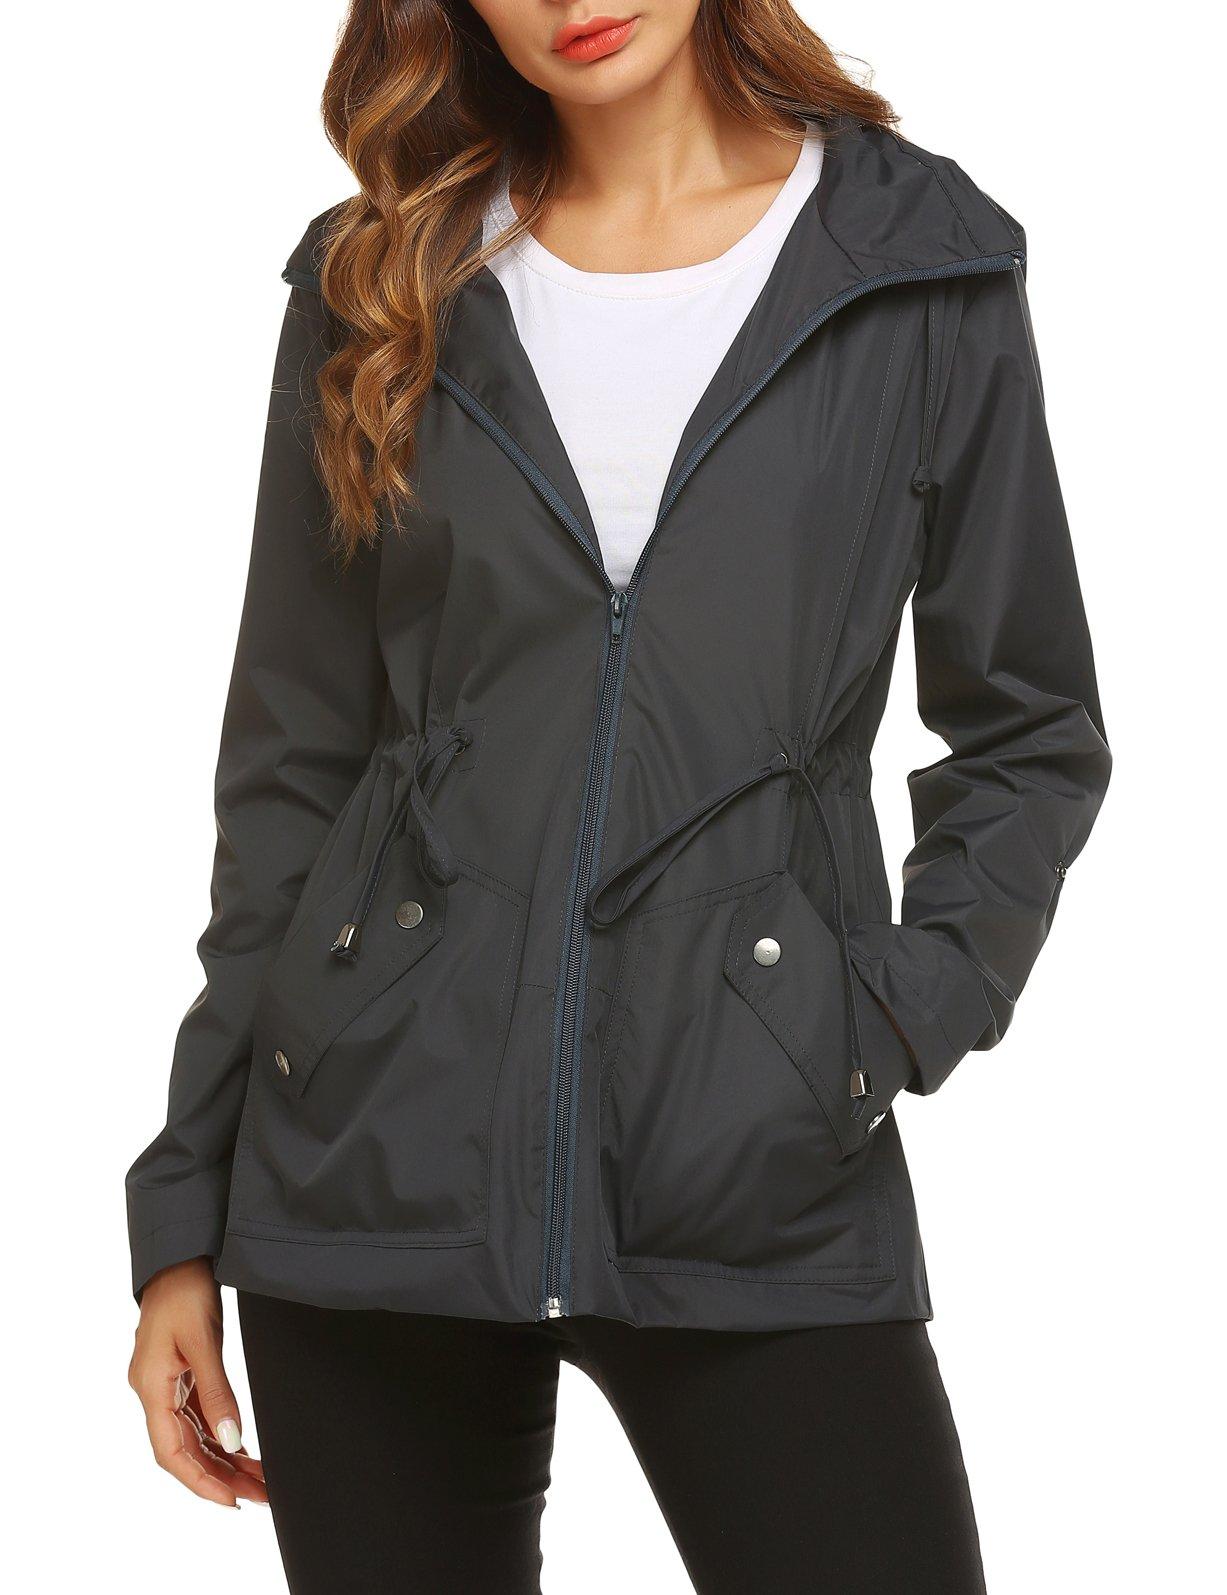 ZHENWEI Ladies Raincoat Fashionable Waterproof Fashionable with Drawstring Hood Camping